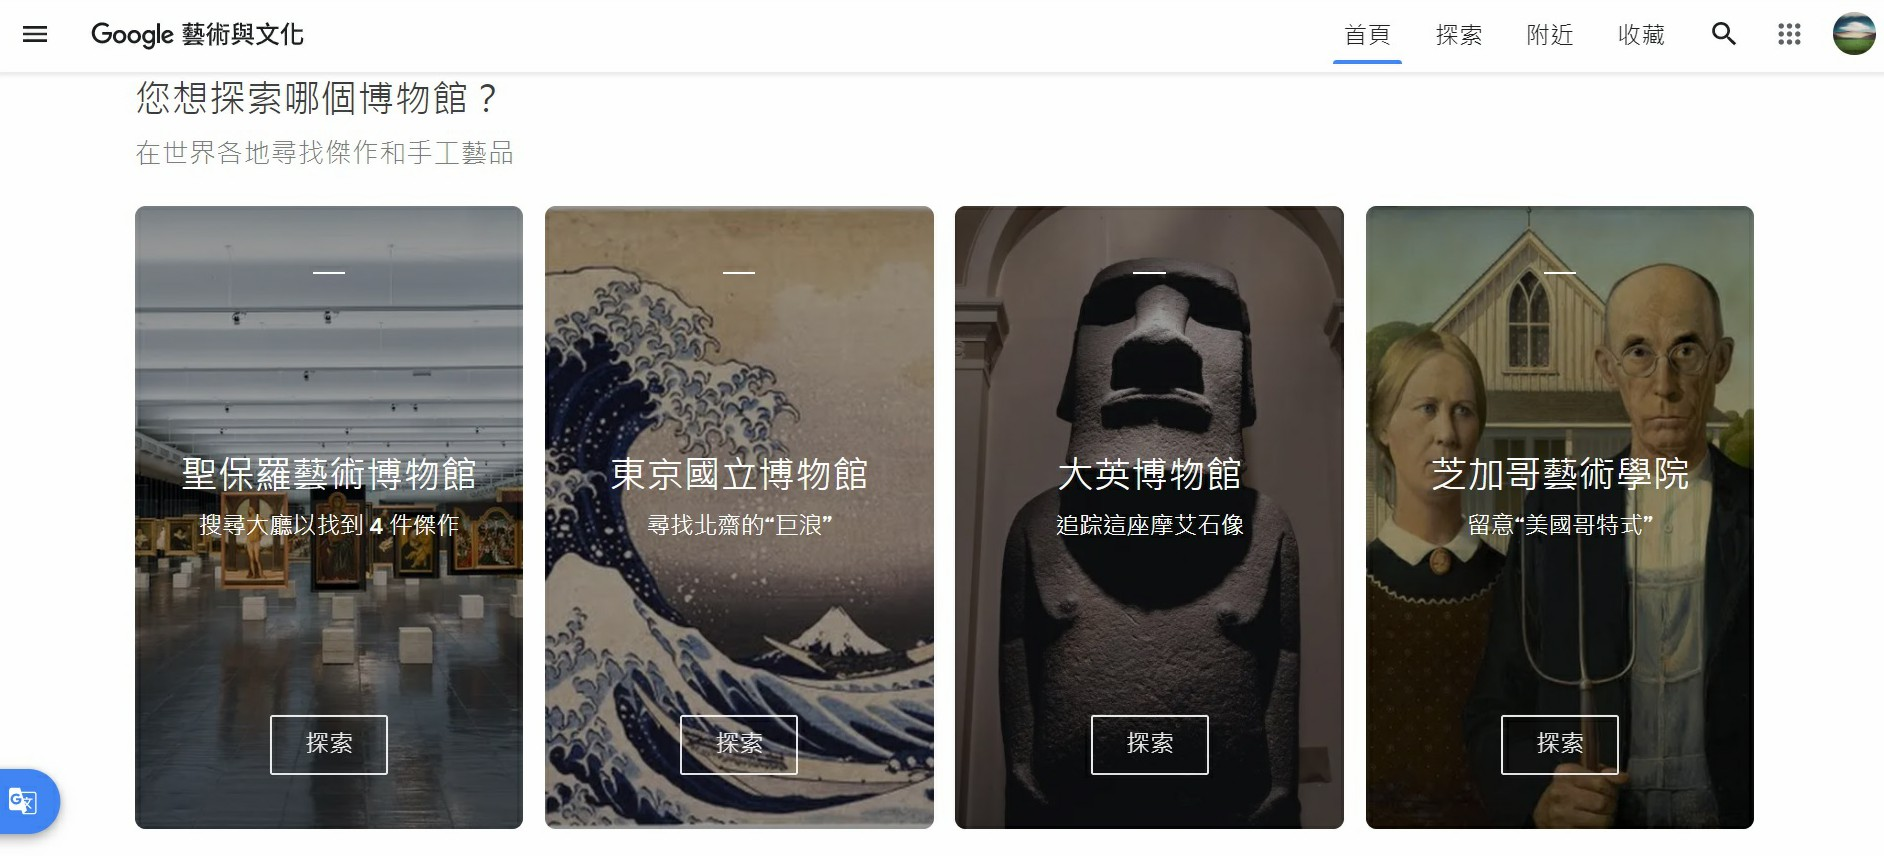 google arts & culture中文,google arts & culture台灣,google arts & culture故宮,google arts & culture教學,Google Arts & Culture,Google 藝術與文化,虛擬實境美術館,線上博物館,線上展覽,線上美術館,Google,Google 街景